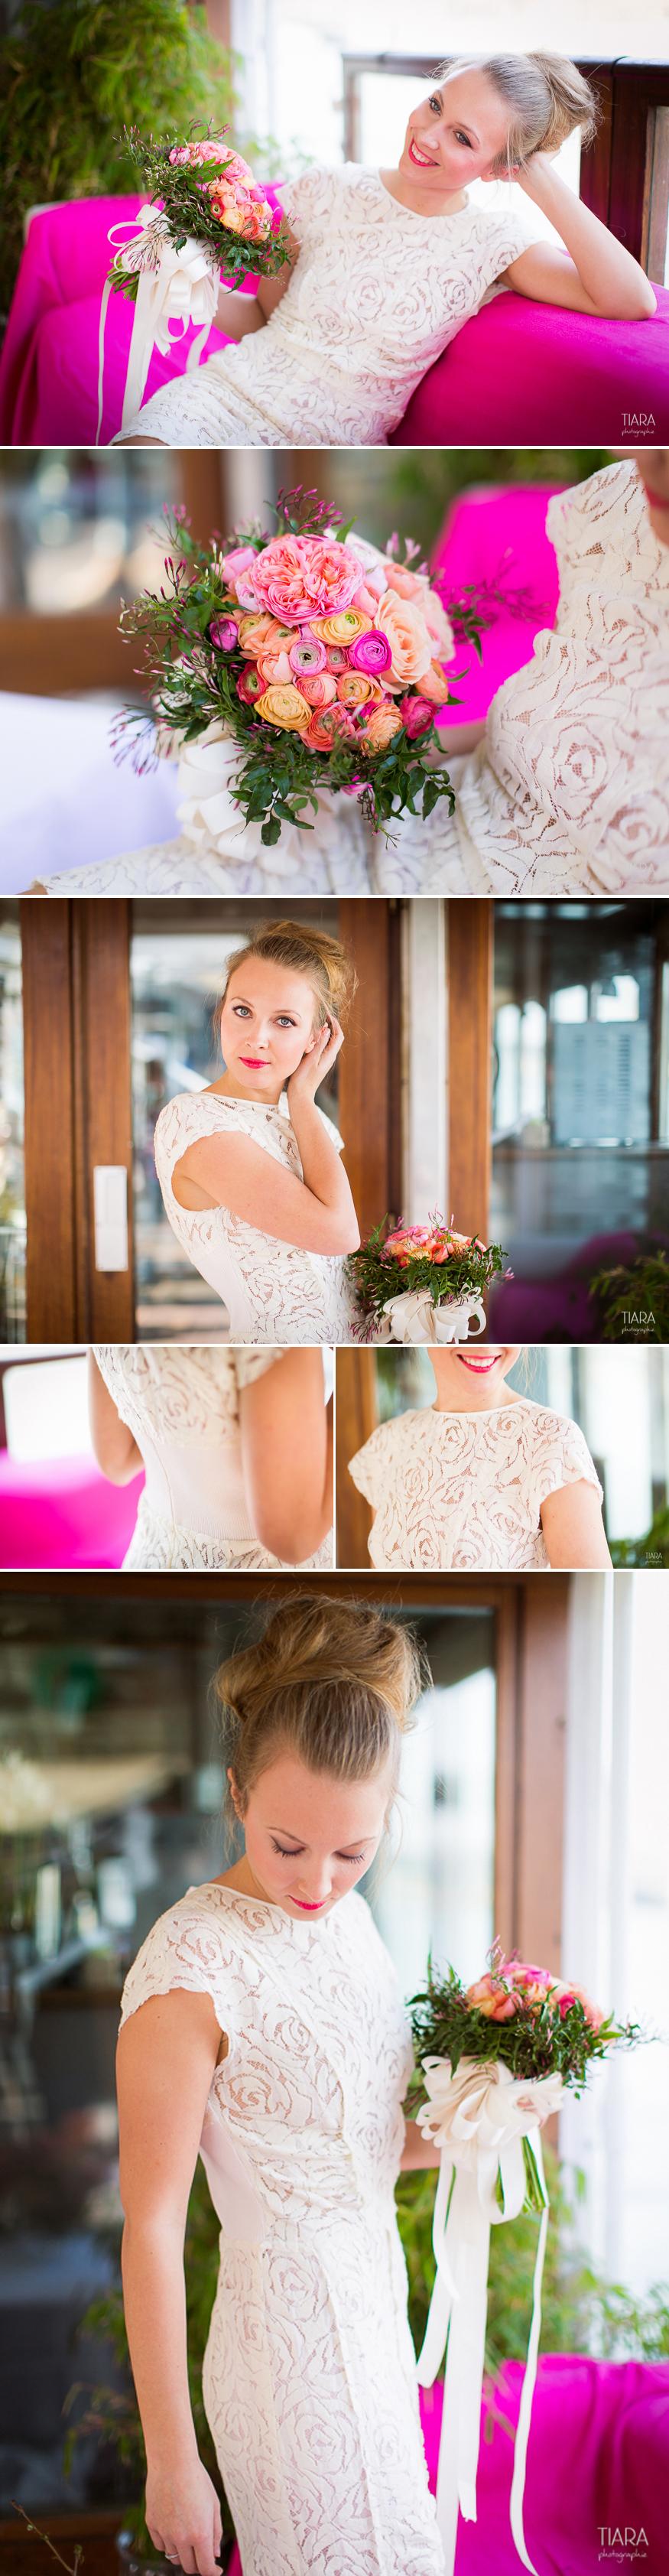 FianceeDuPanda photographe mariage paris